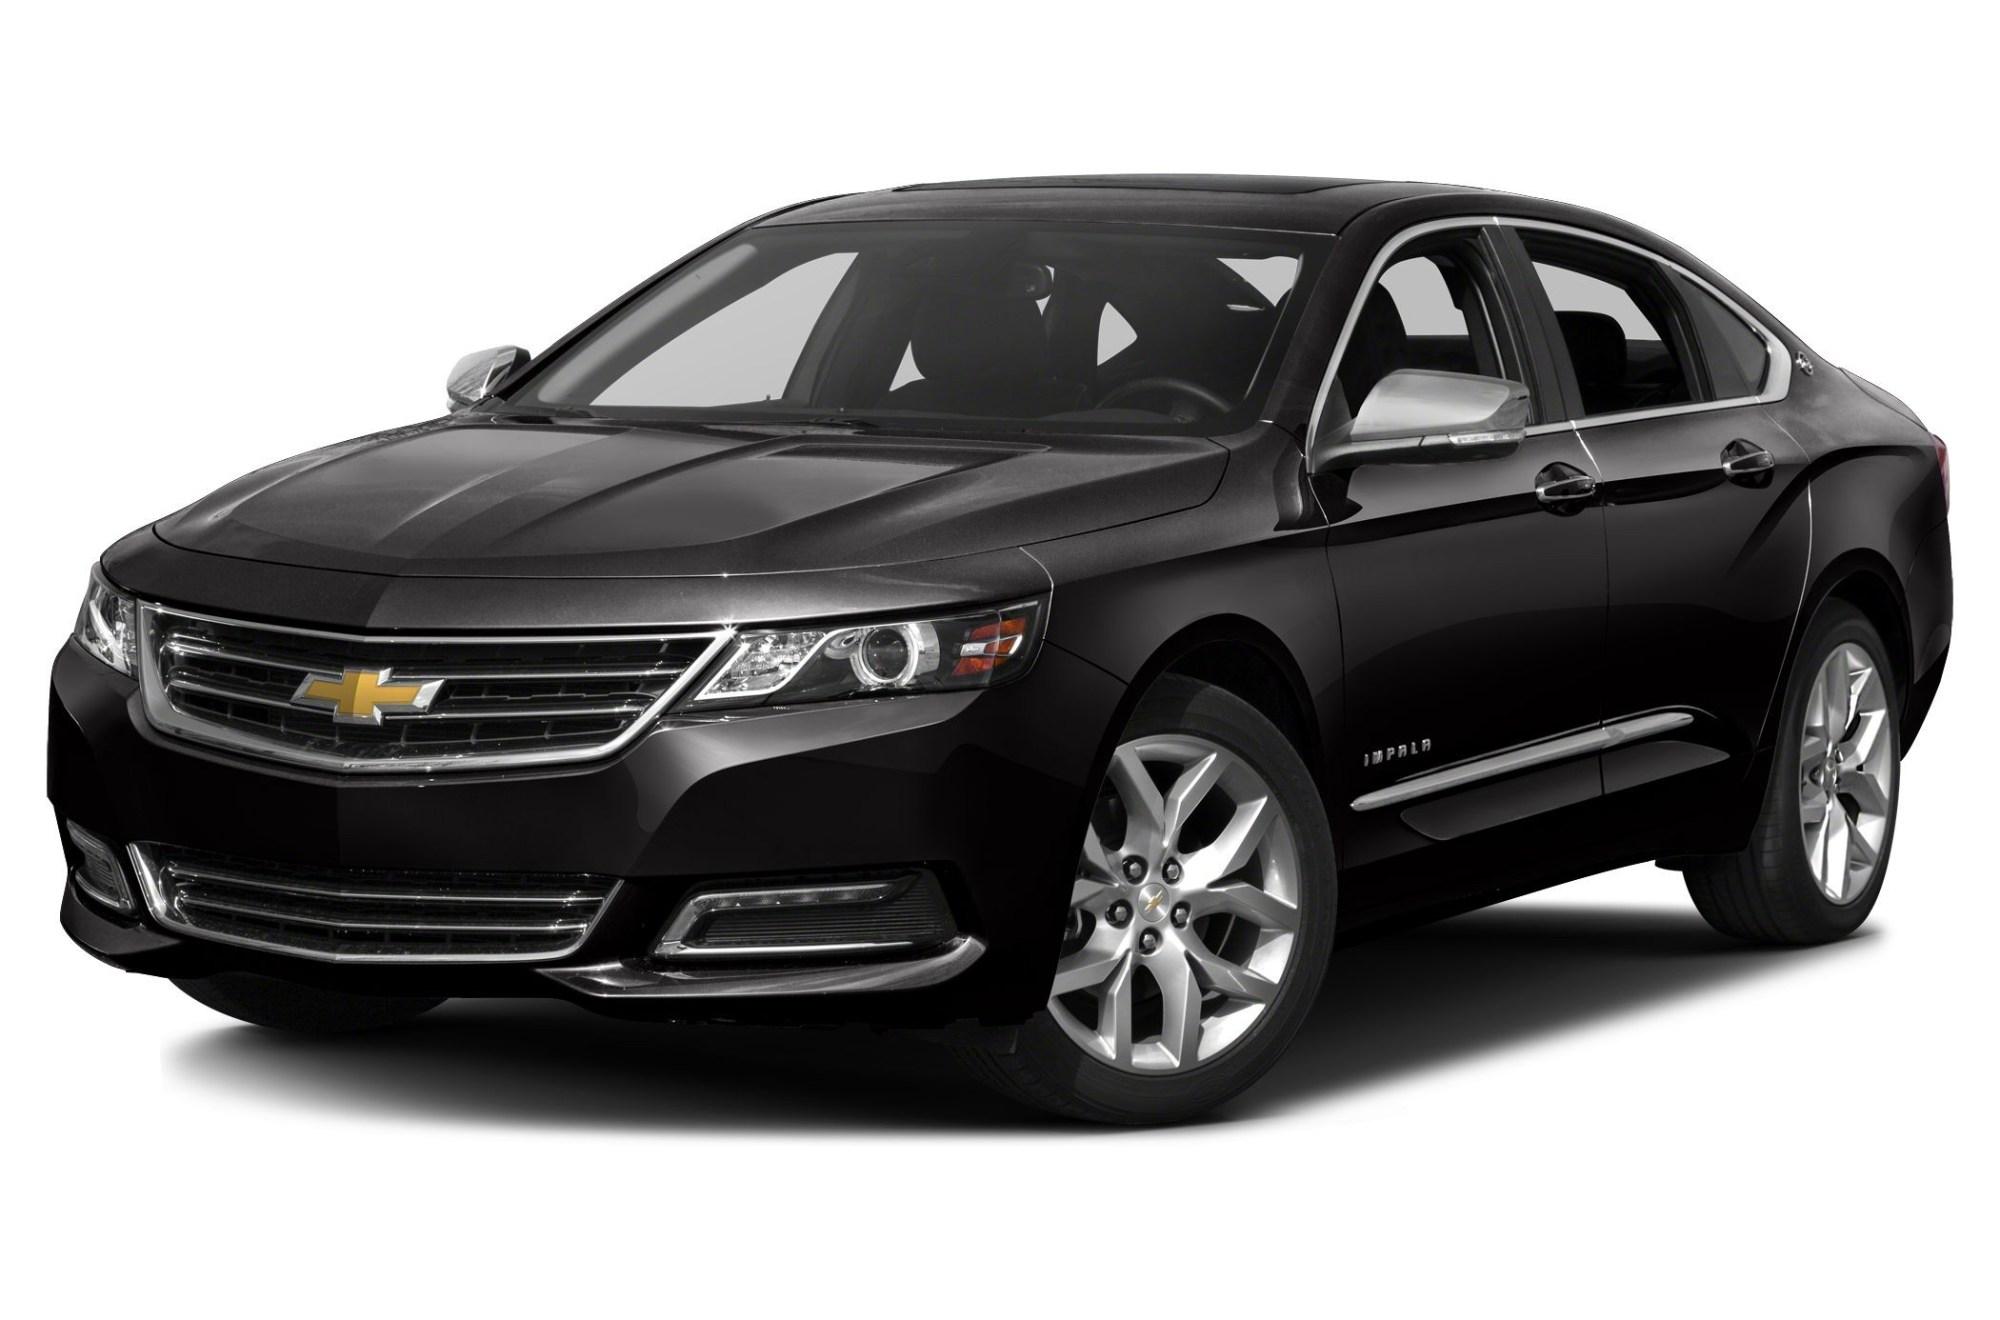 hight resolution of 2001 chevy impala 3 8 engine diagram 2015 chevrolet impala information of 2001 chevy impala 3